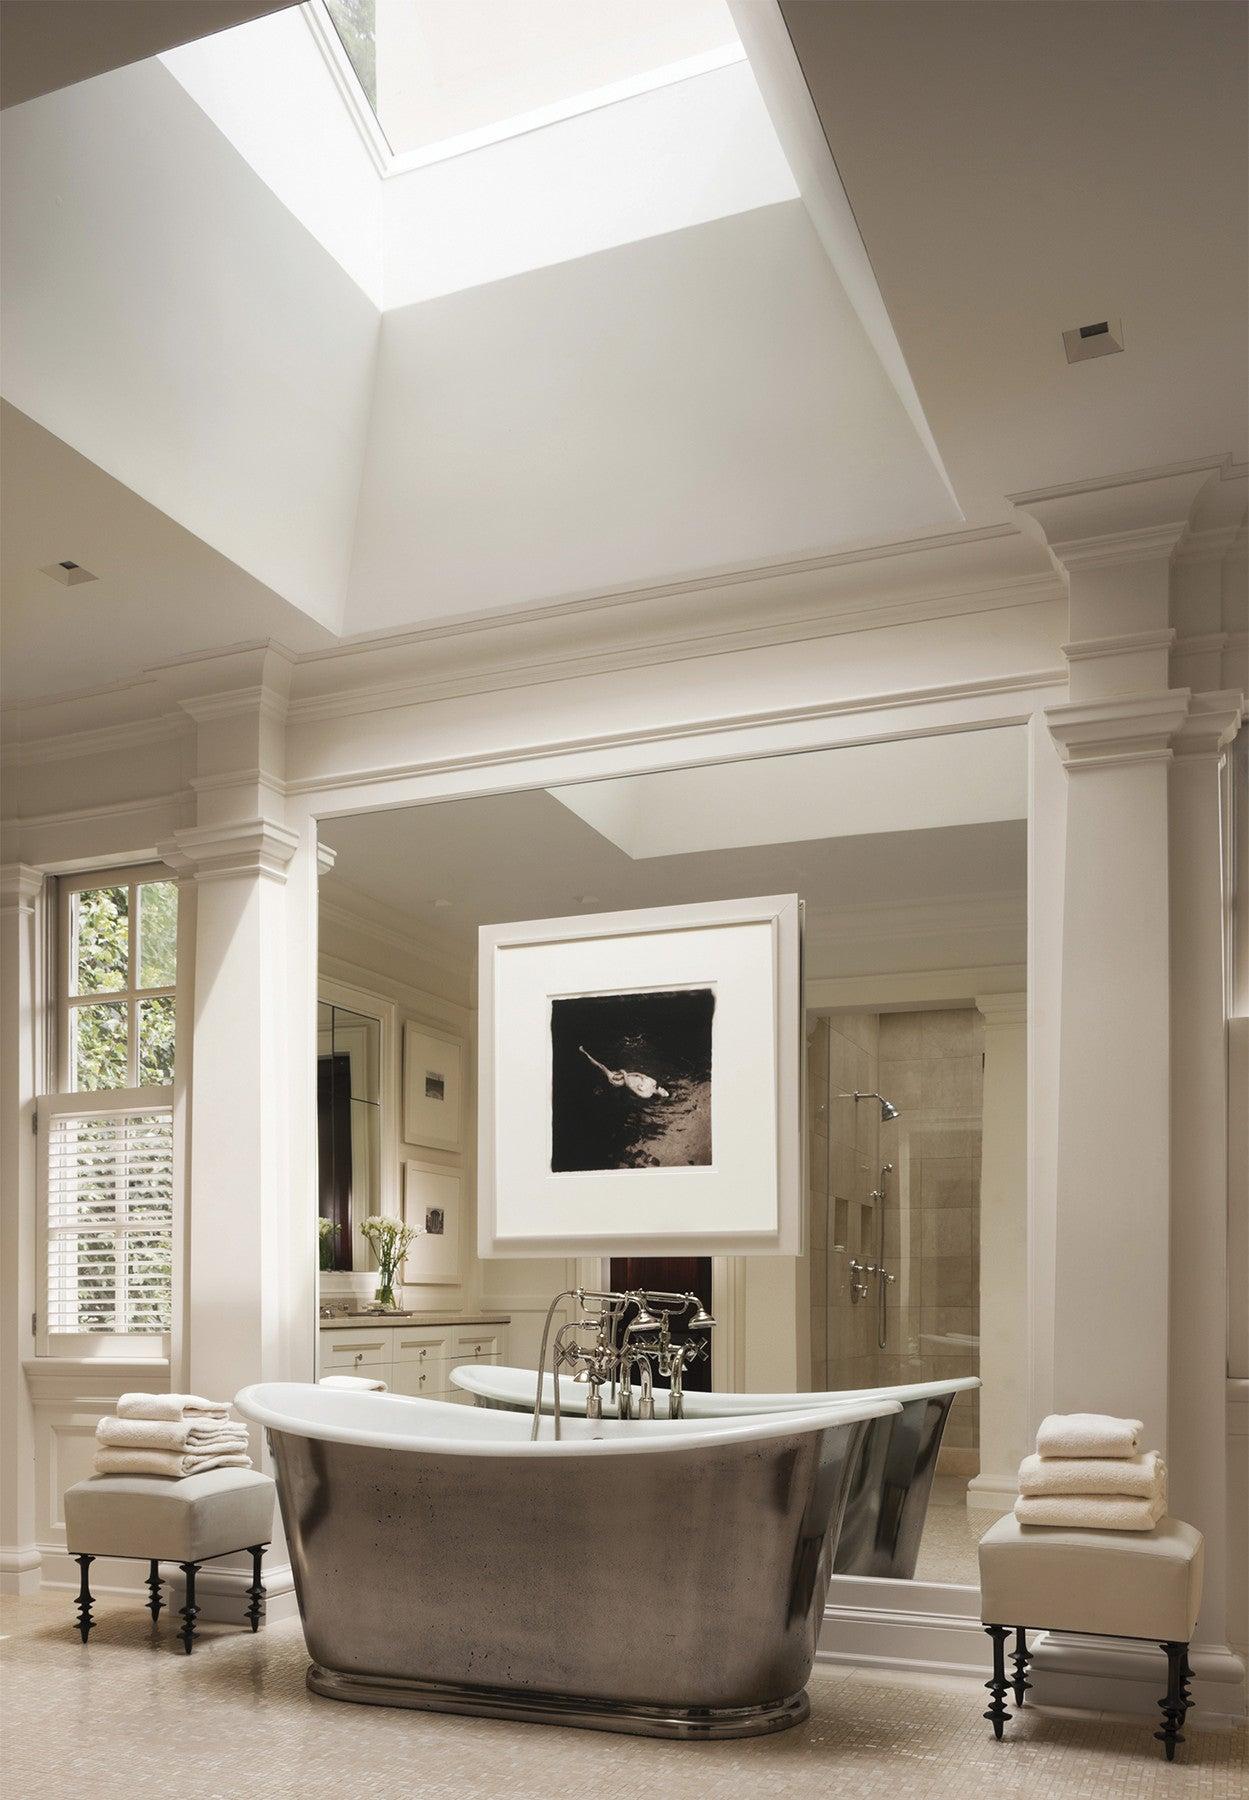 Bathroom Design Ideas Amp Pictures On 1stdibs